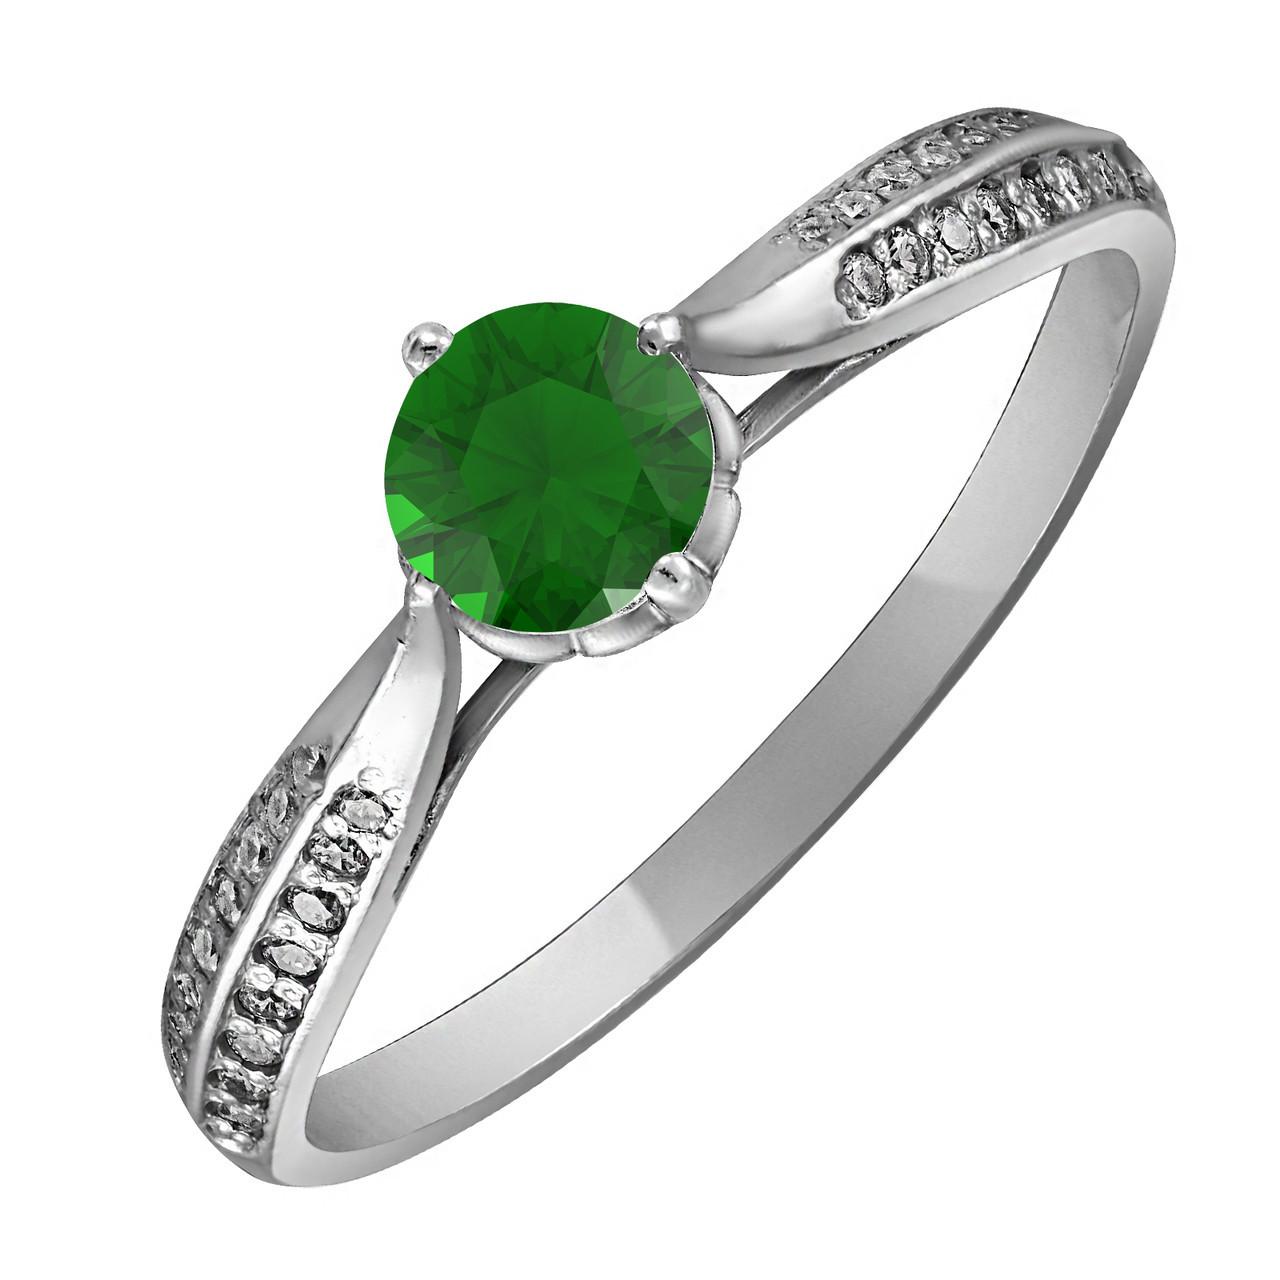 Кольцо из серебра с зелёным кубическим цирконием Twiddle Jewelry 17.5 размер (К007з-17.5)